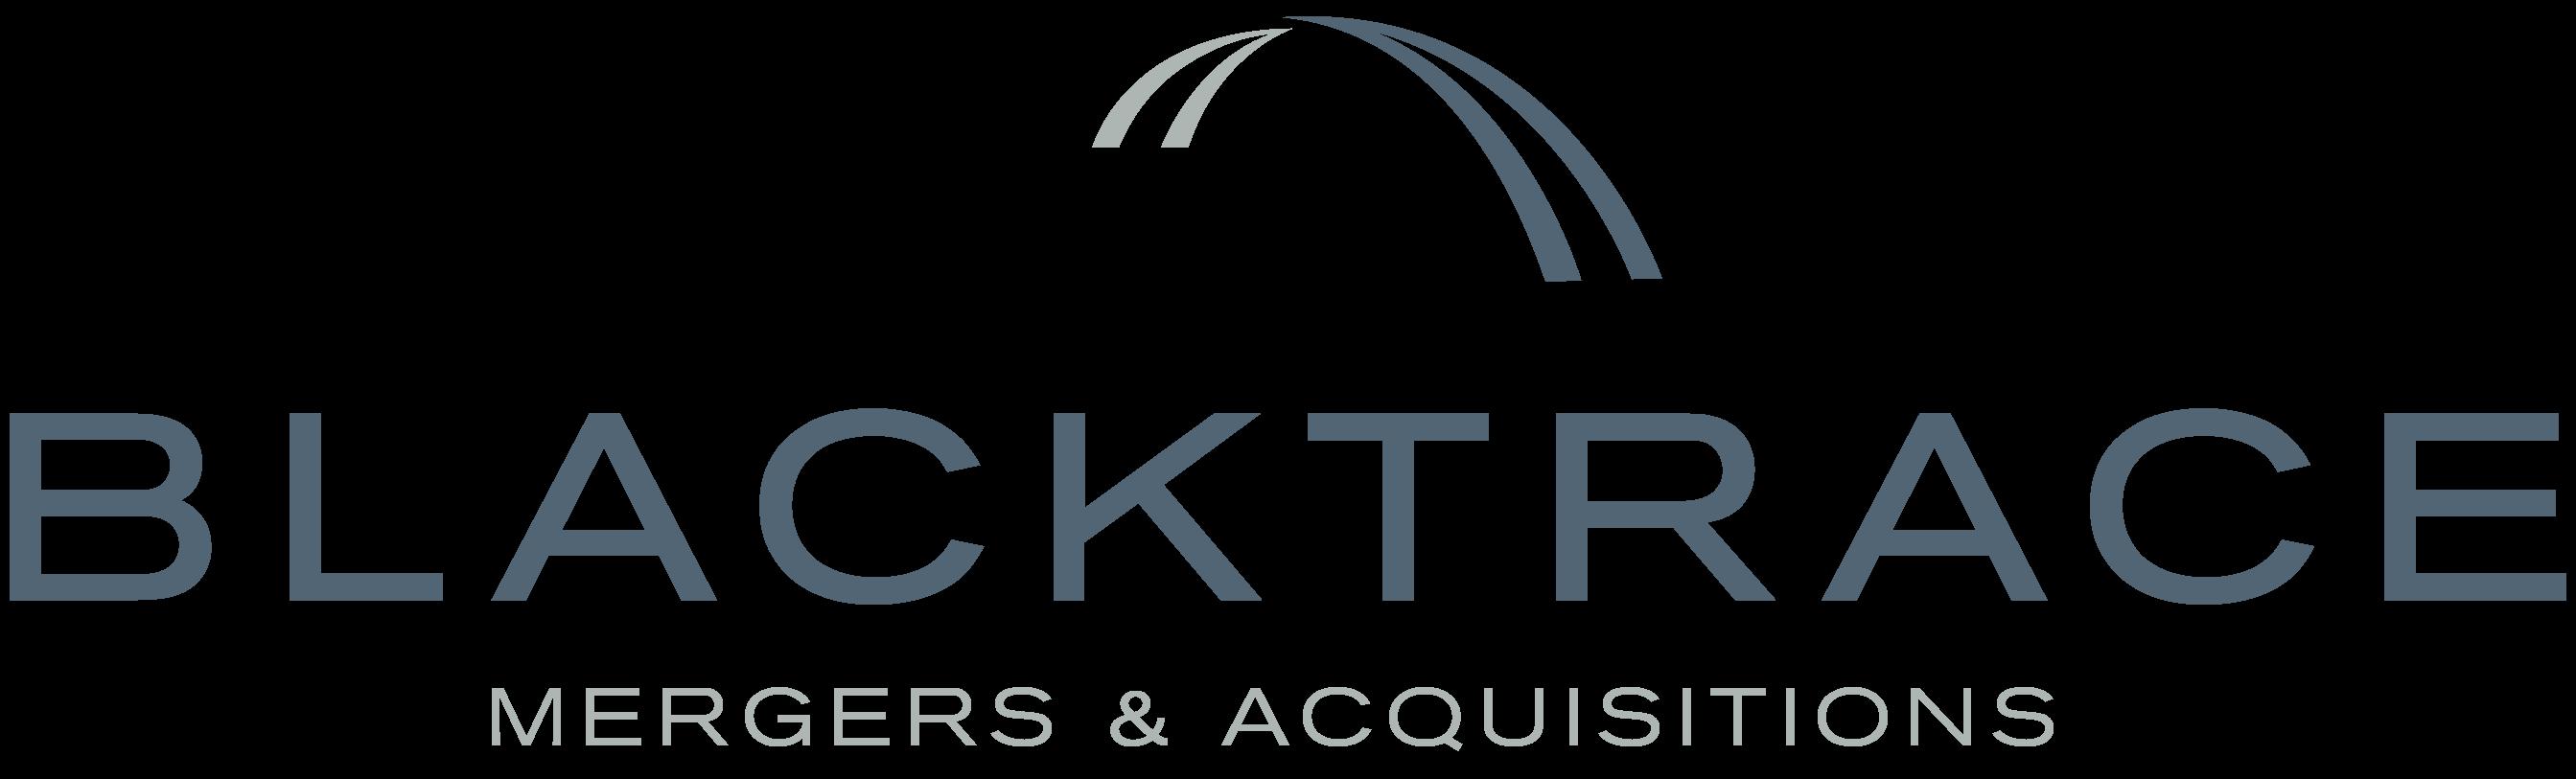 Blacktrace logo